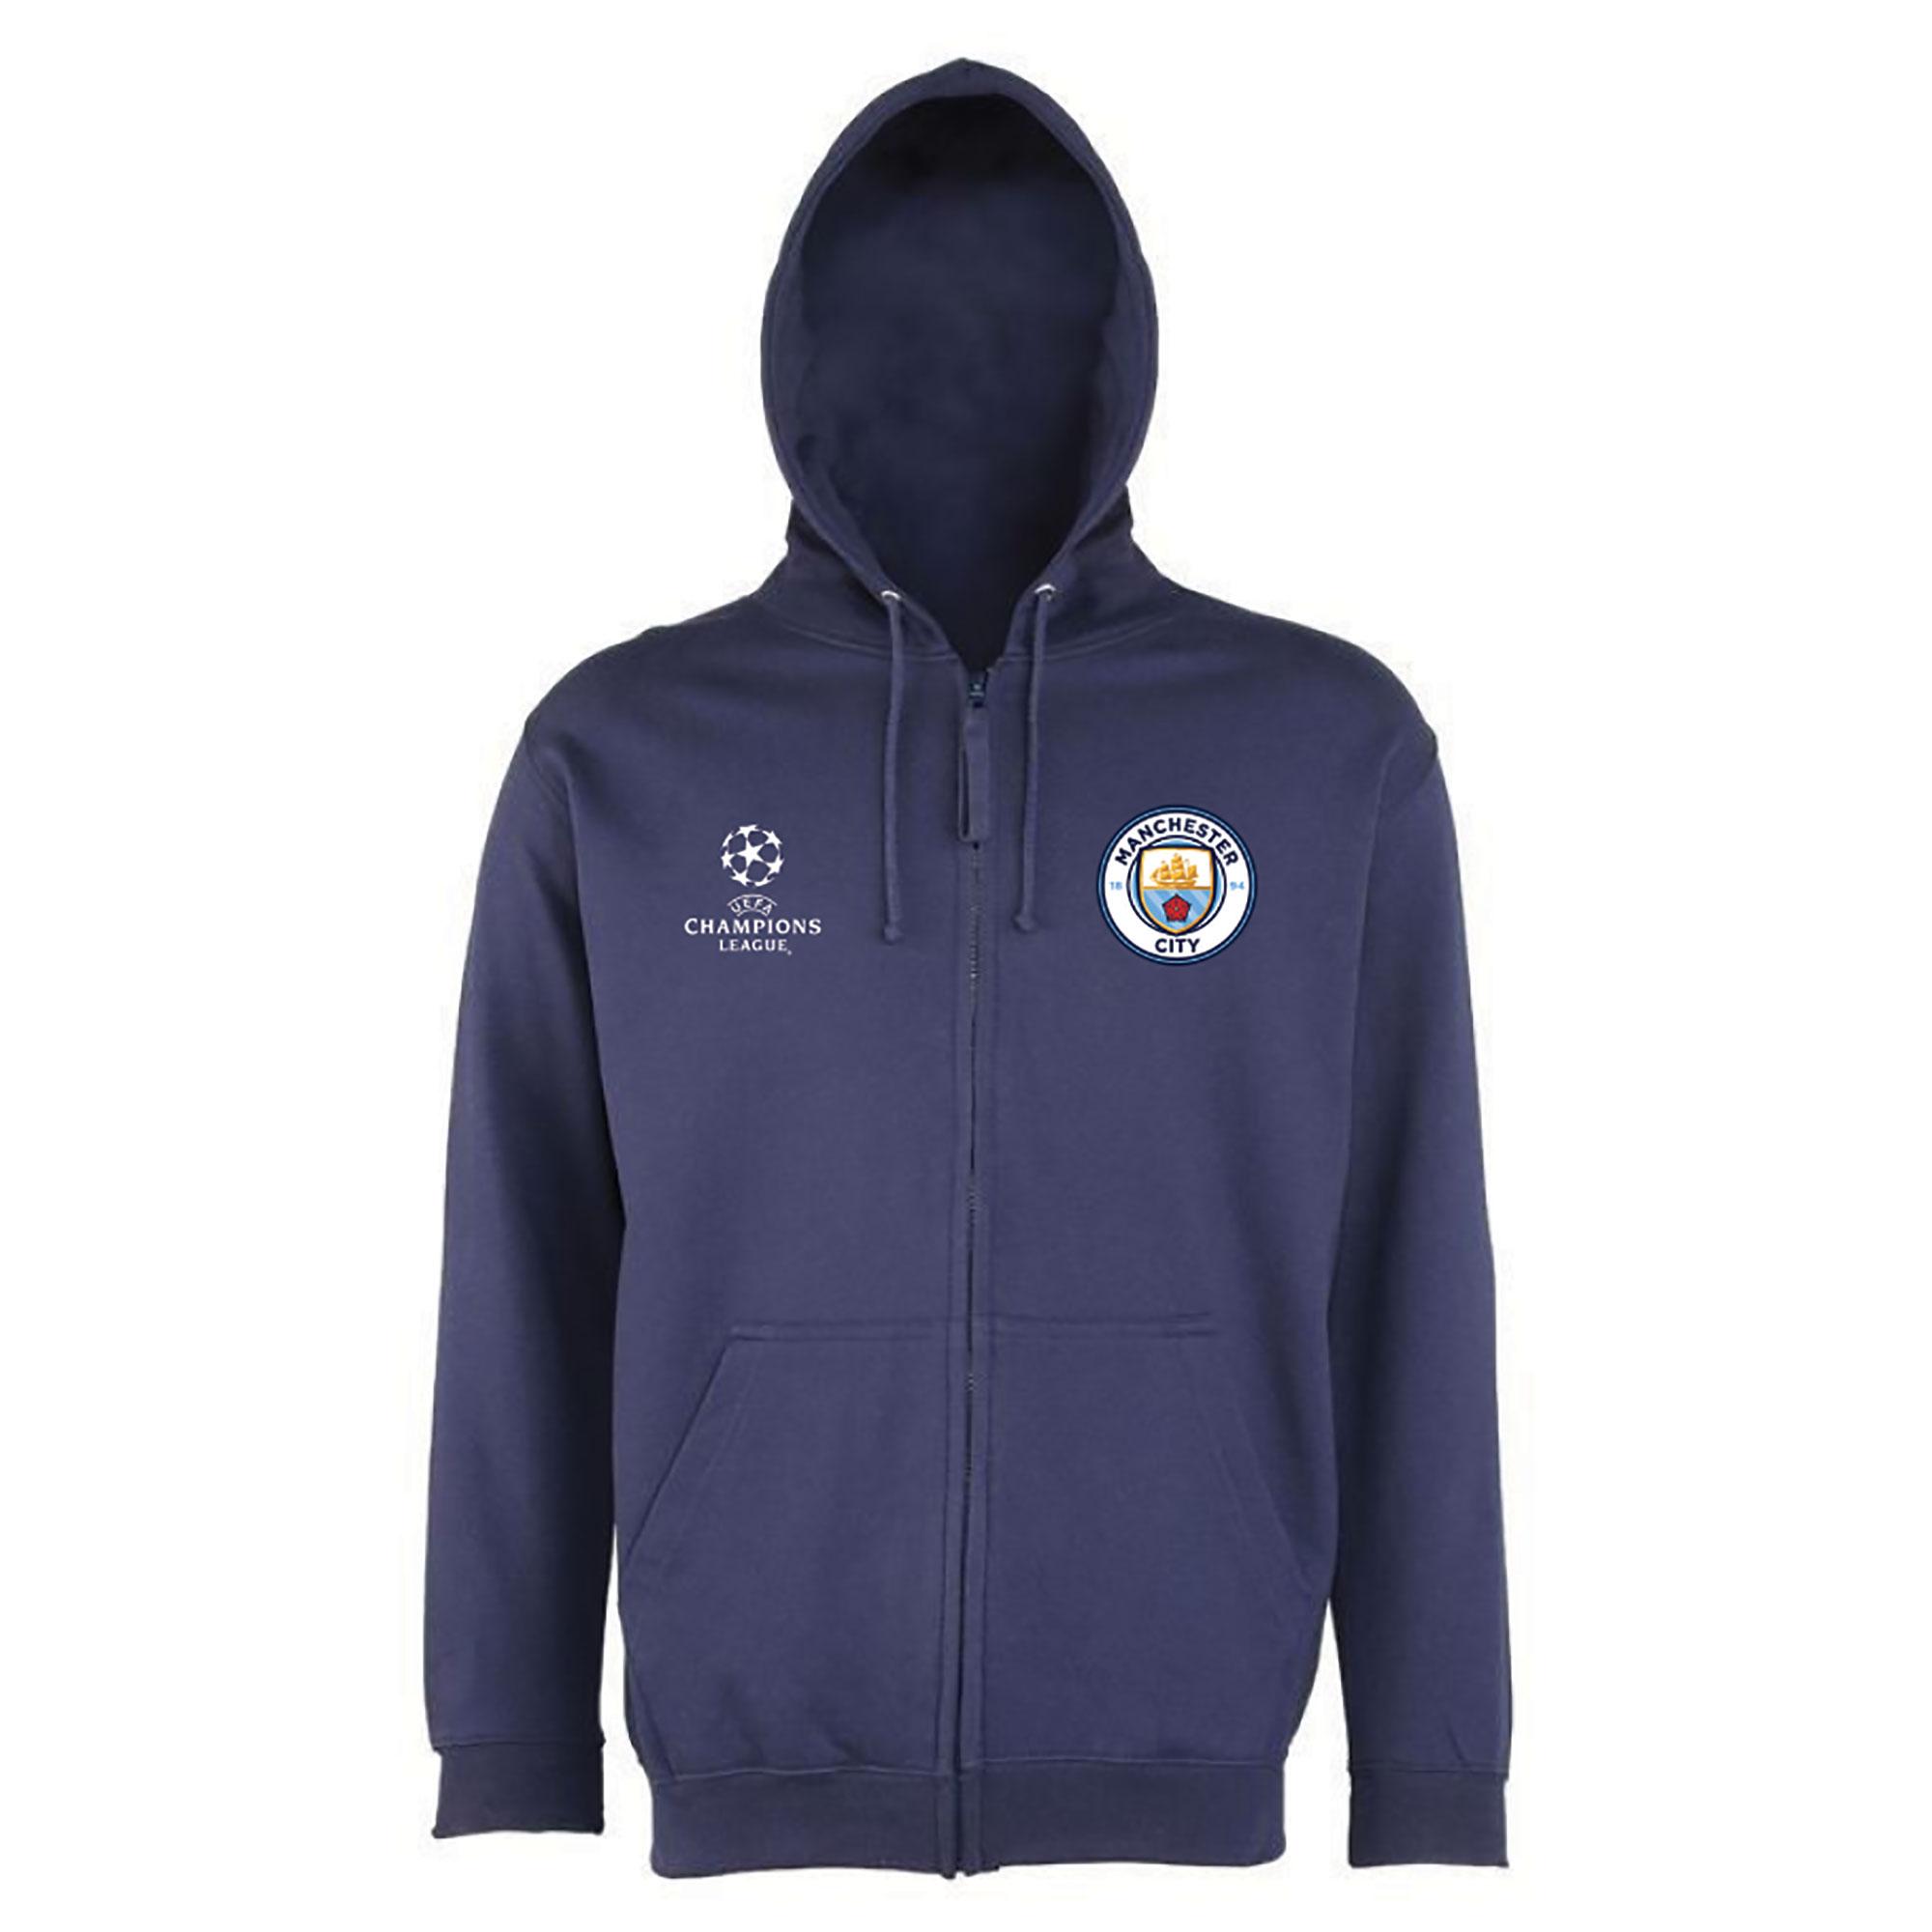 Manchester City UEFA Champions League Zip Hoodie - Navy - Mens